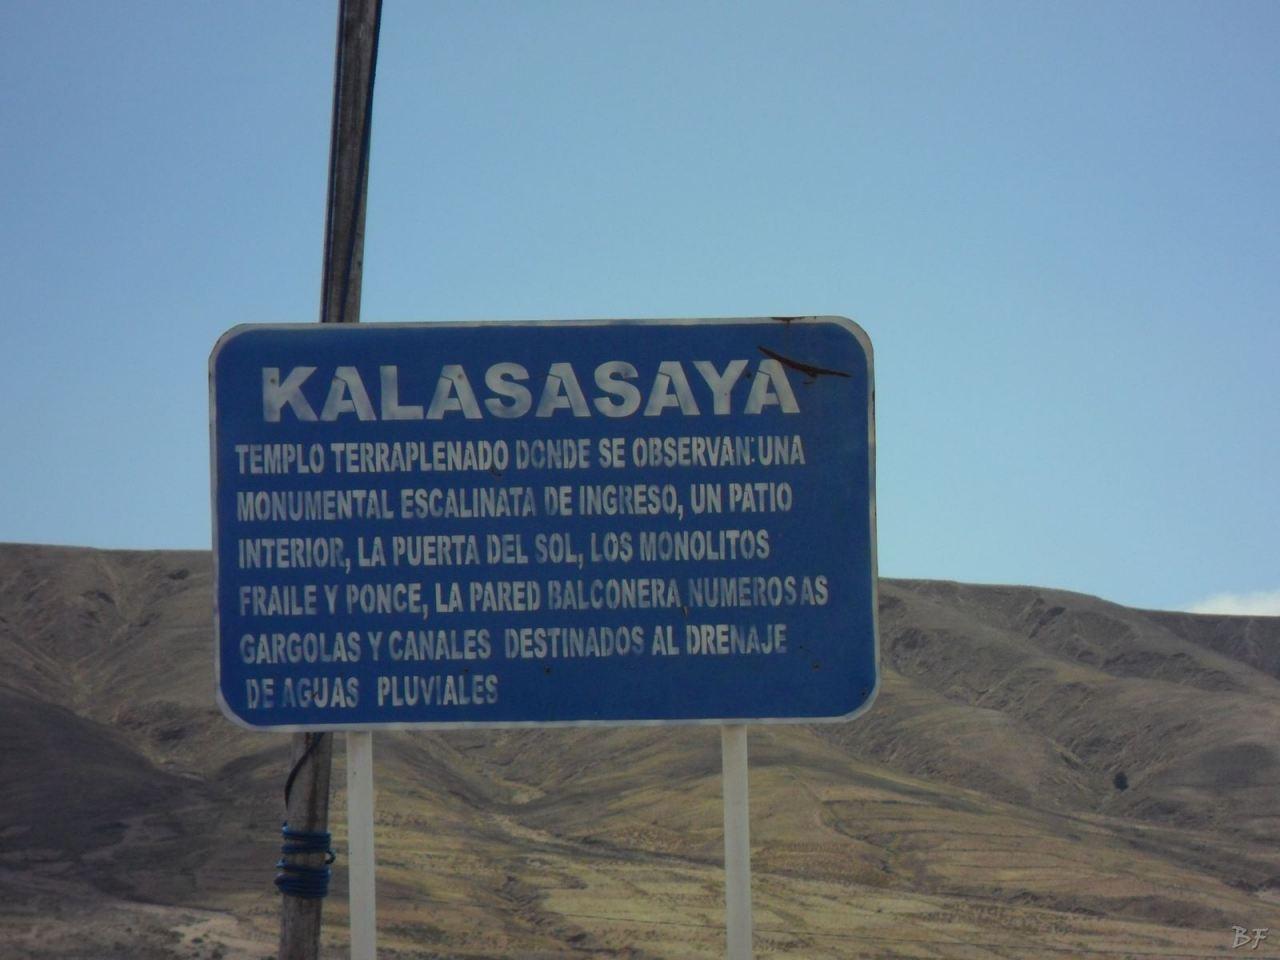 Sito-Megalitico-Piramide-Akapana-Kalasasaya-Menhir-Tiahuanaco-Bolivia-71